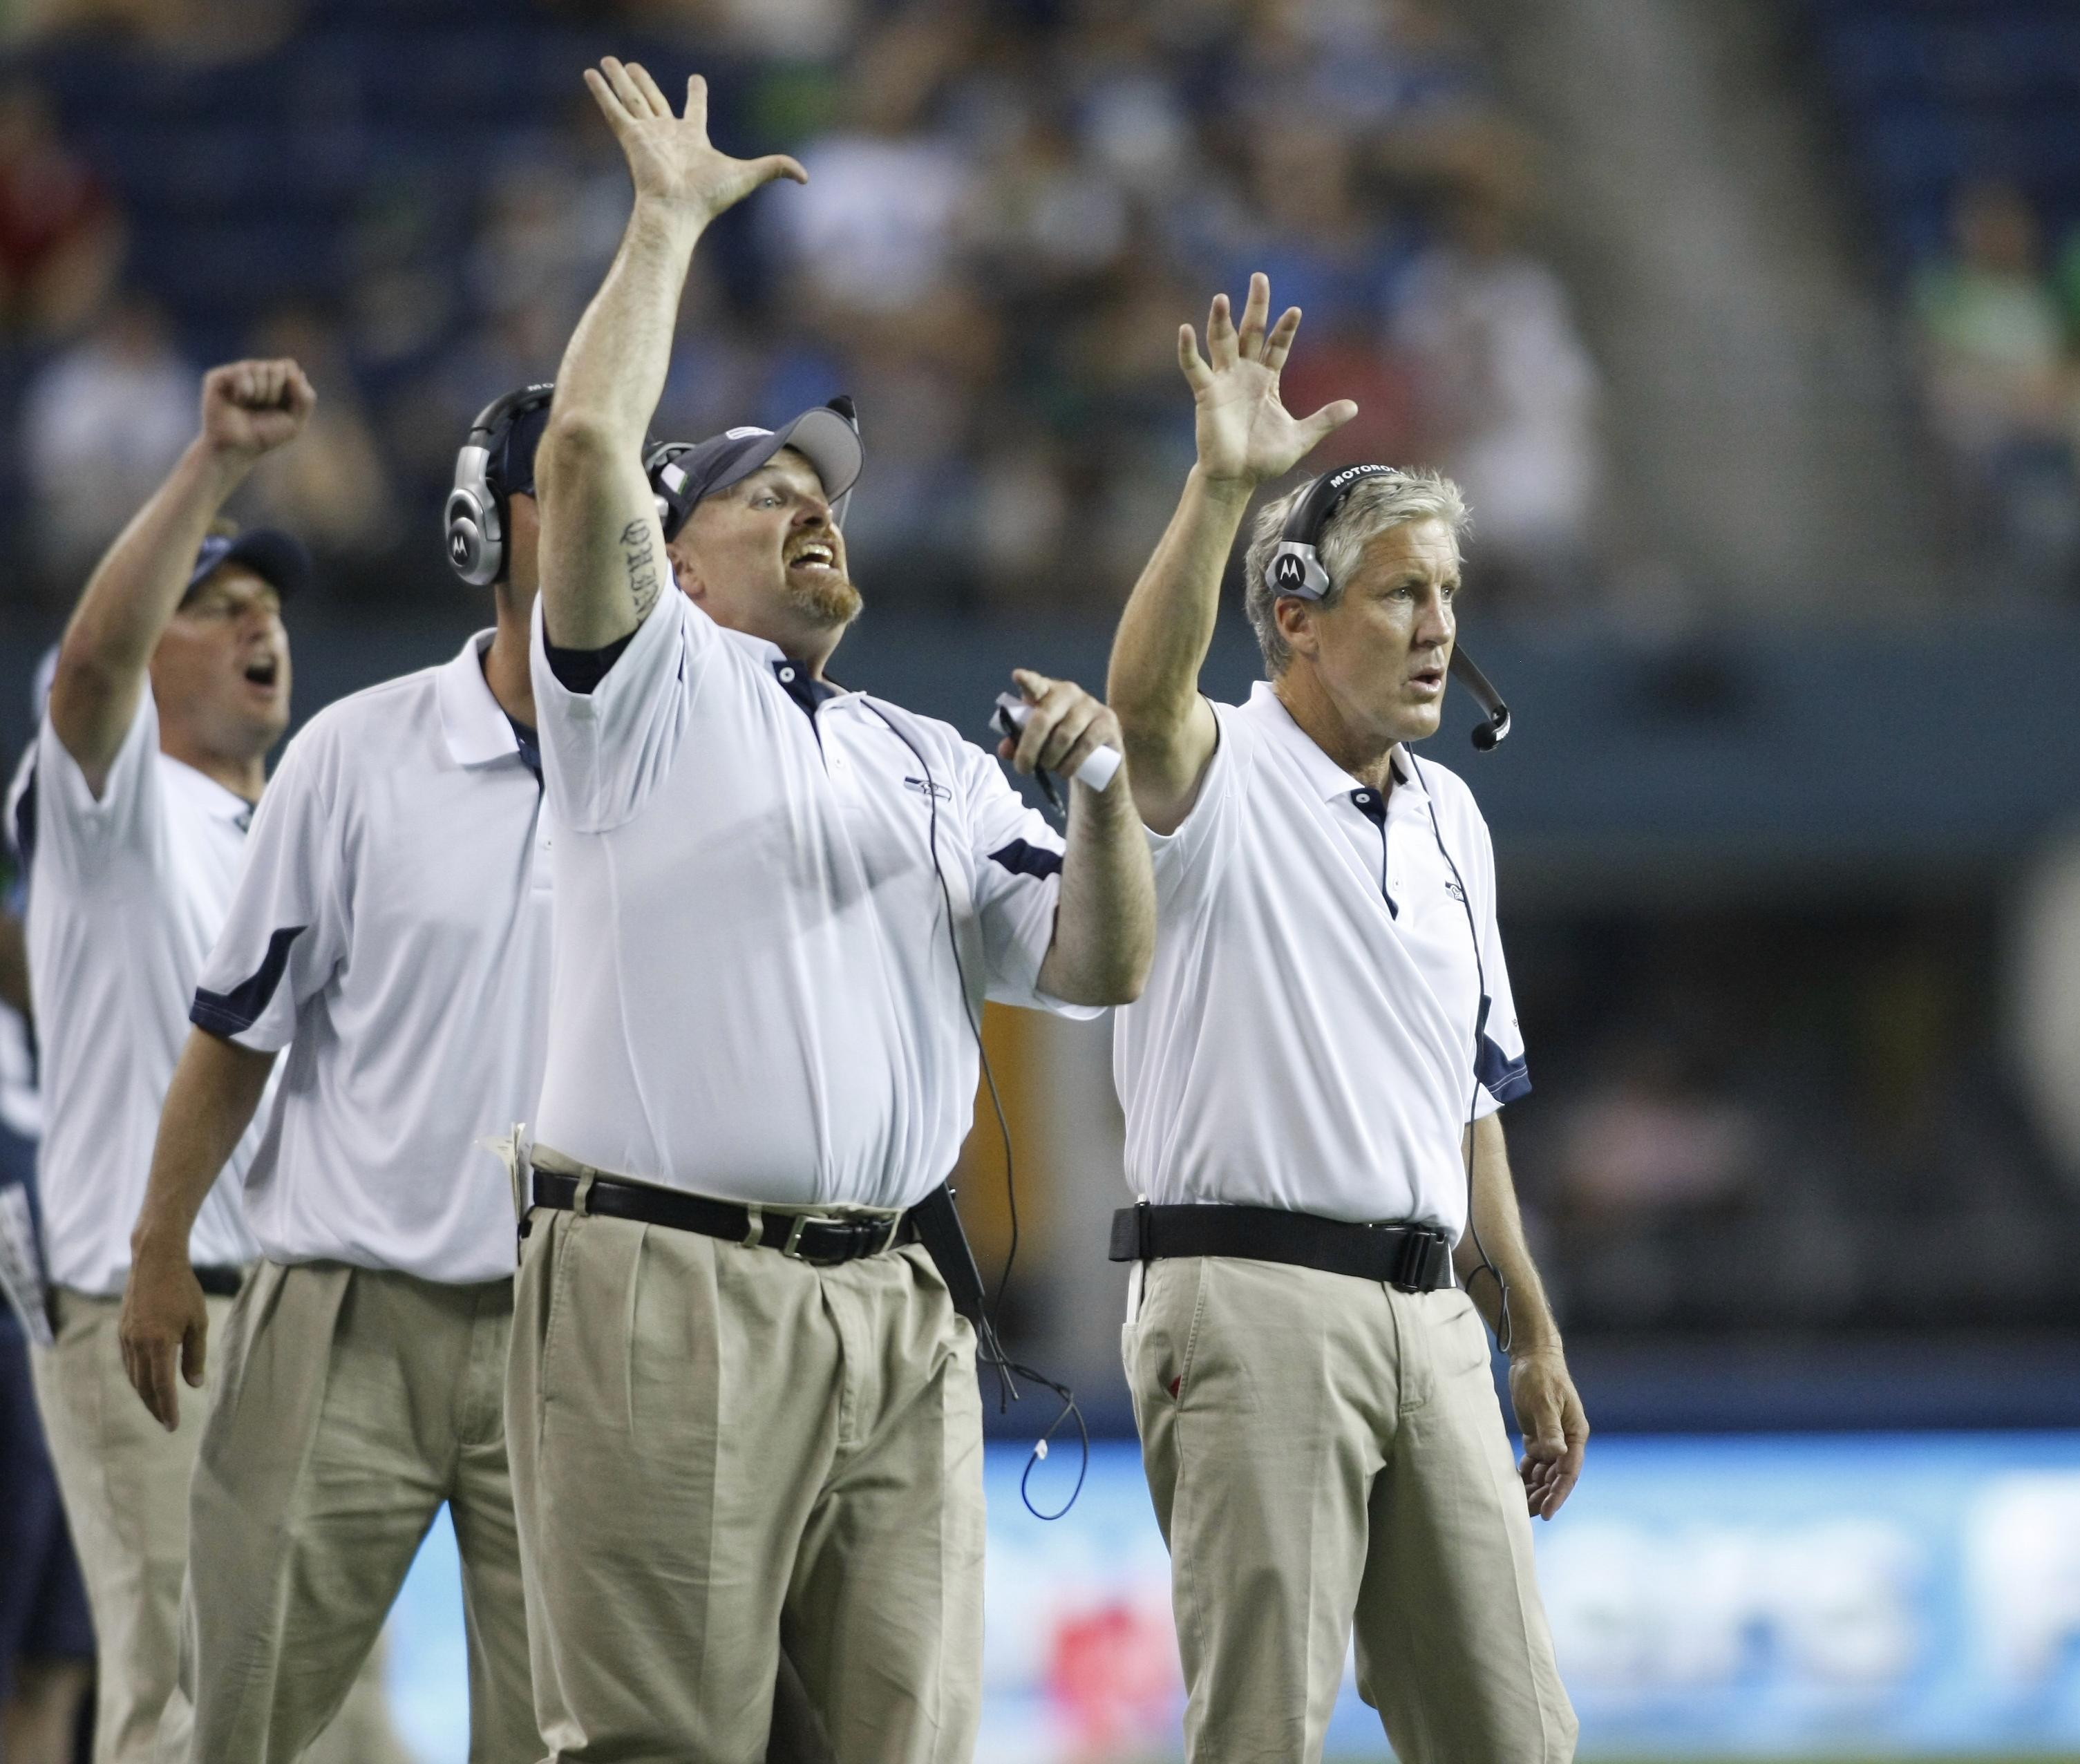 In Copycat Nfl Seattle S Defensive Scheme Keeps Spreading The Spokesman Review